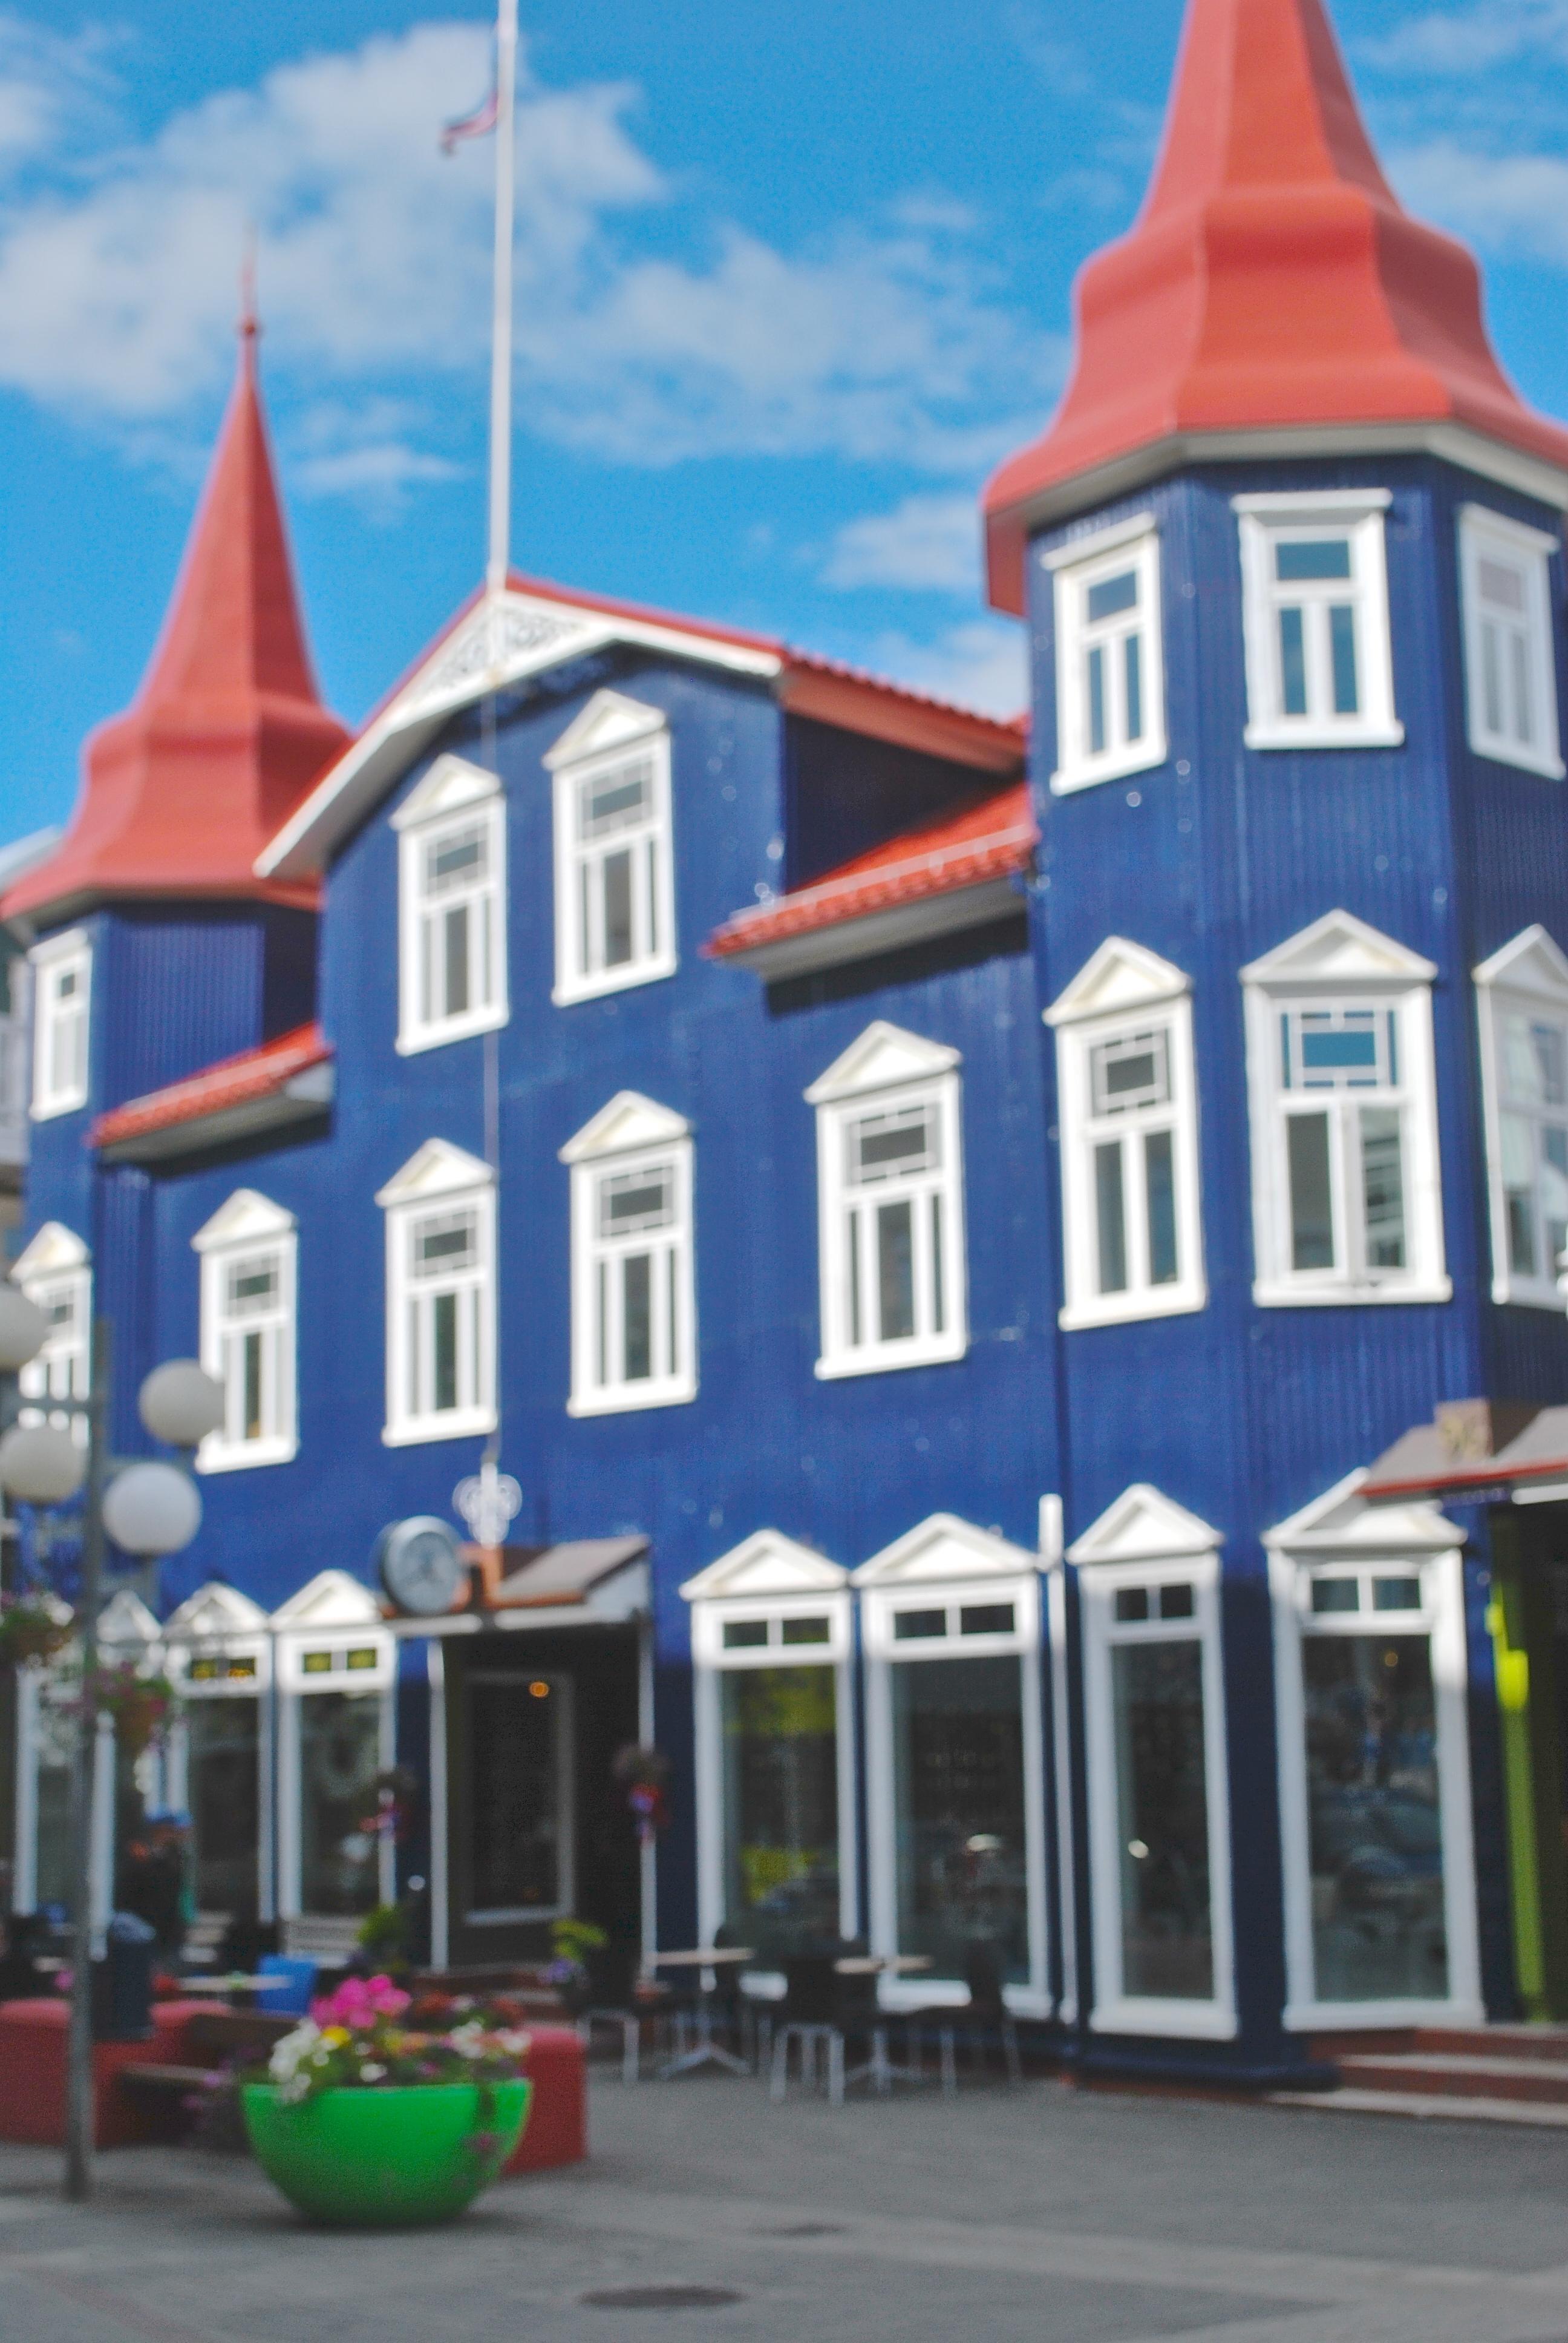 Bláa kannan Bláa kannan coffee house in Akureyri, Iceland